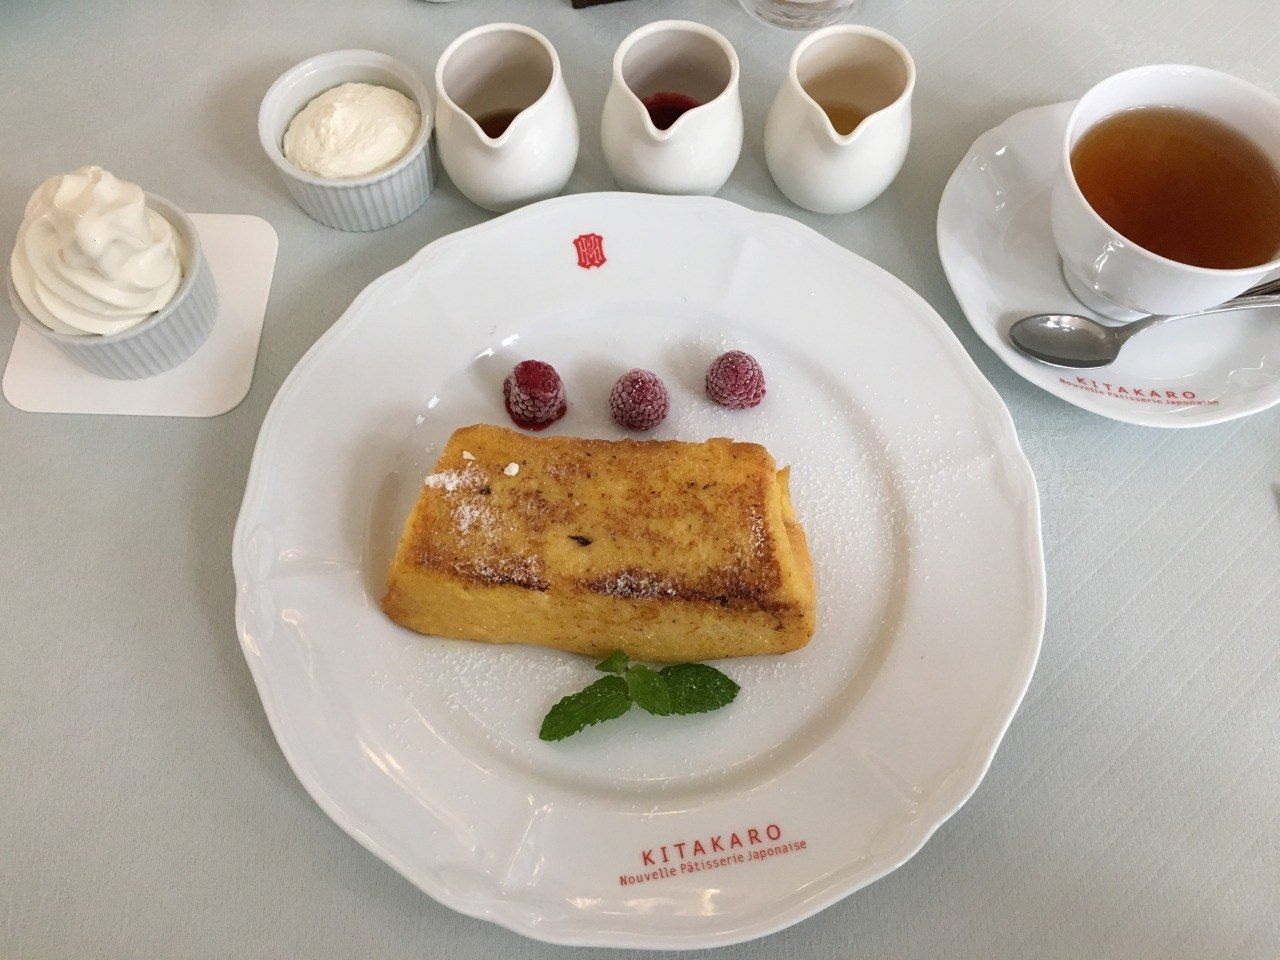 The French Cake (650 yen)